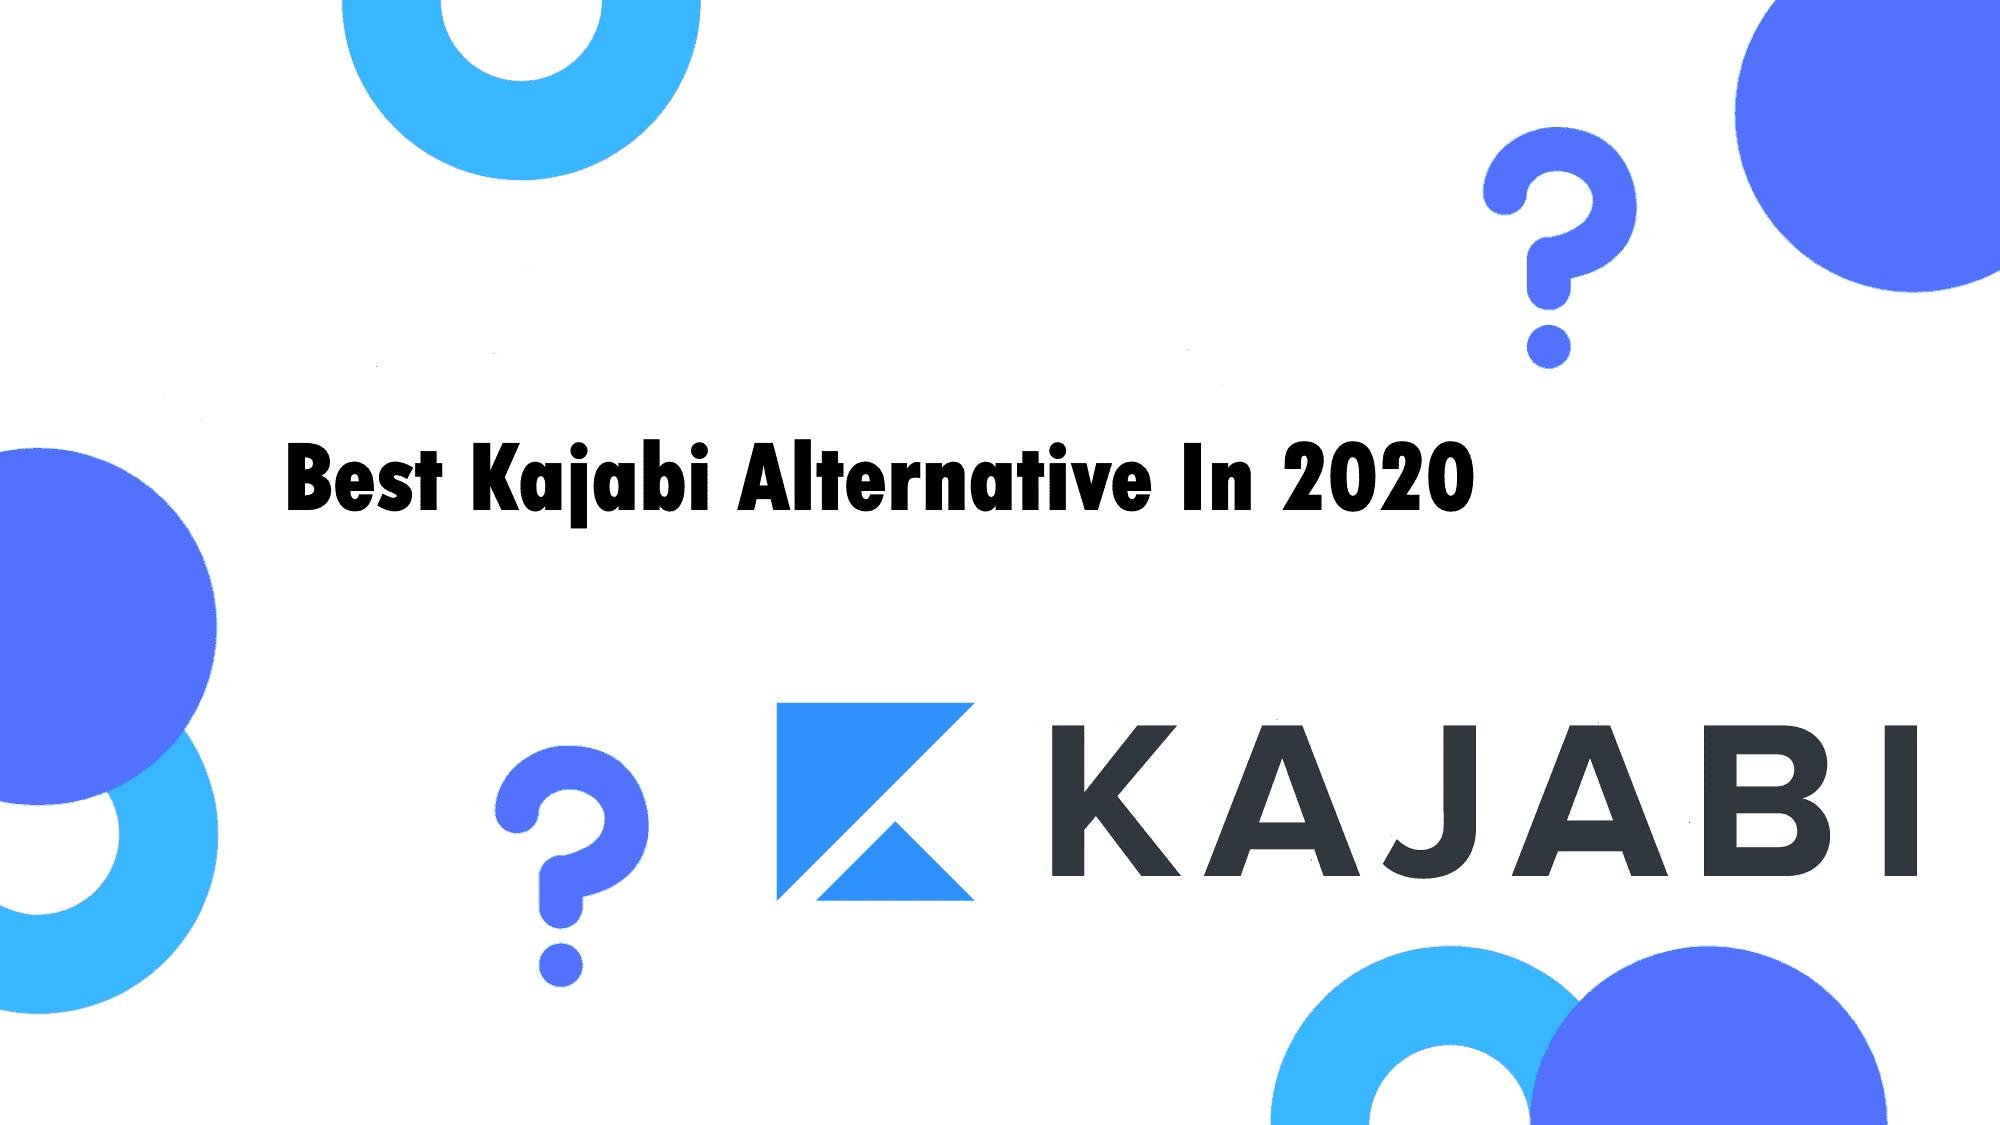 The Best Kajabi Alternative You'll Find in 2020